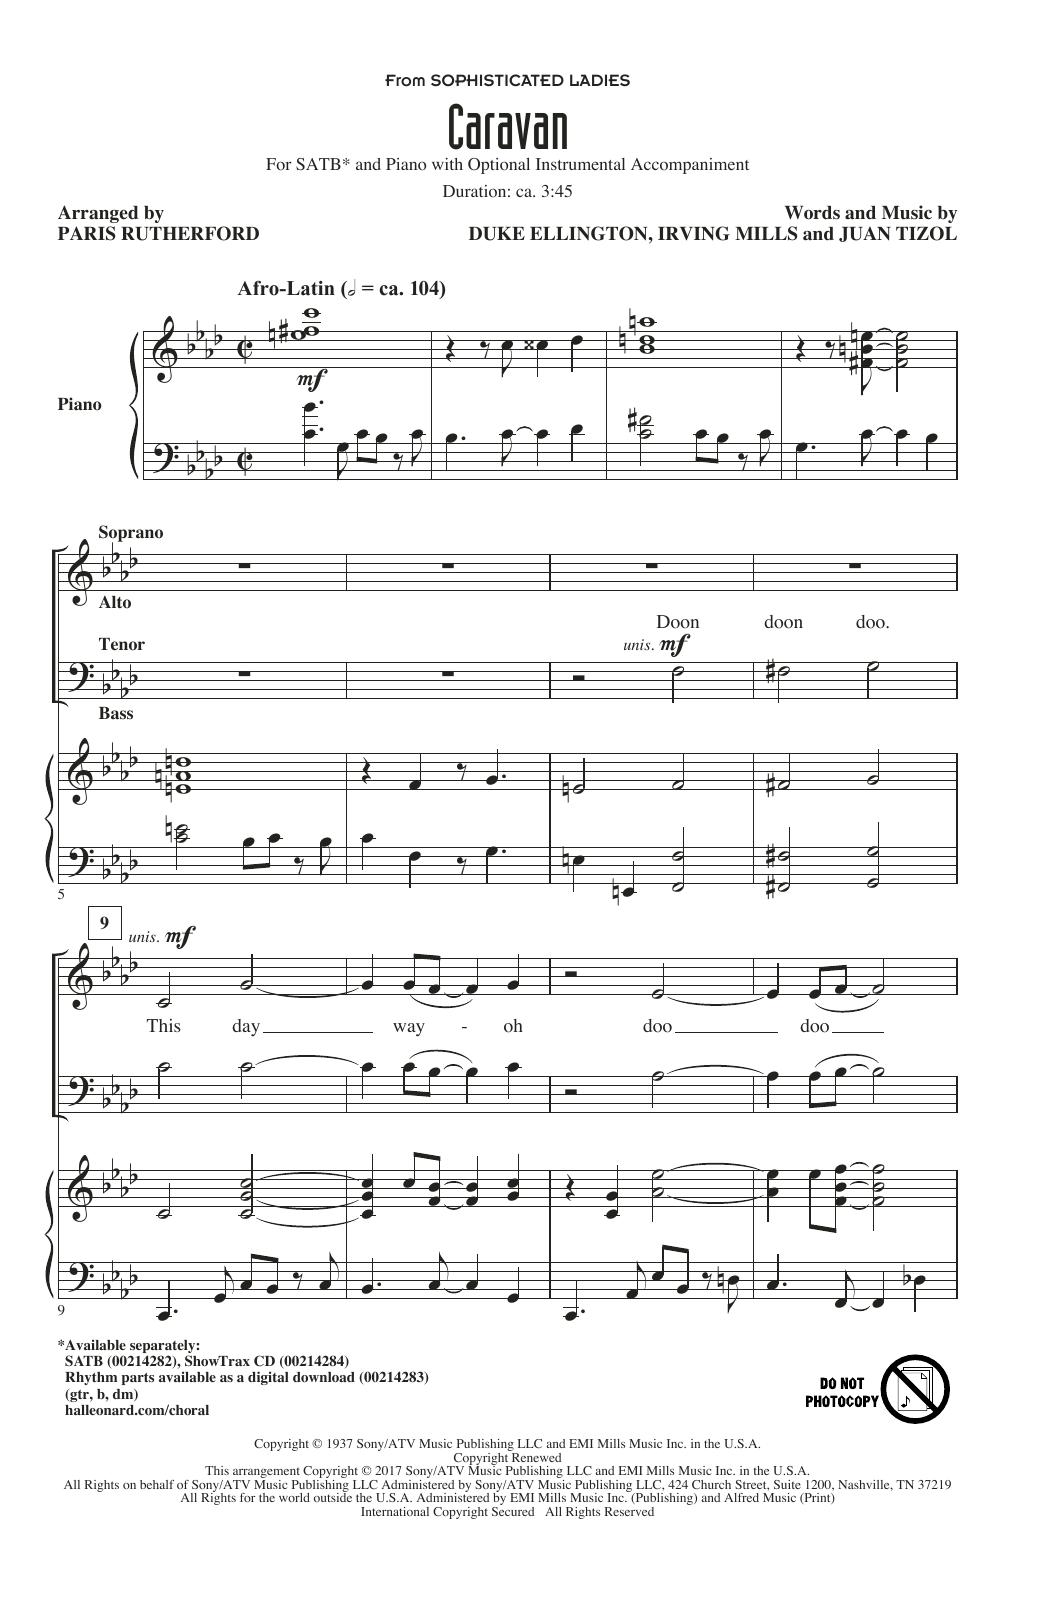 Paris Rutherford Caravan Sheet Music Notes Chords Printable